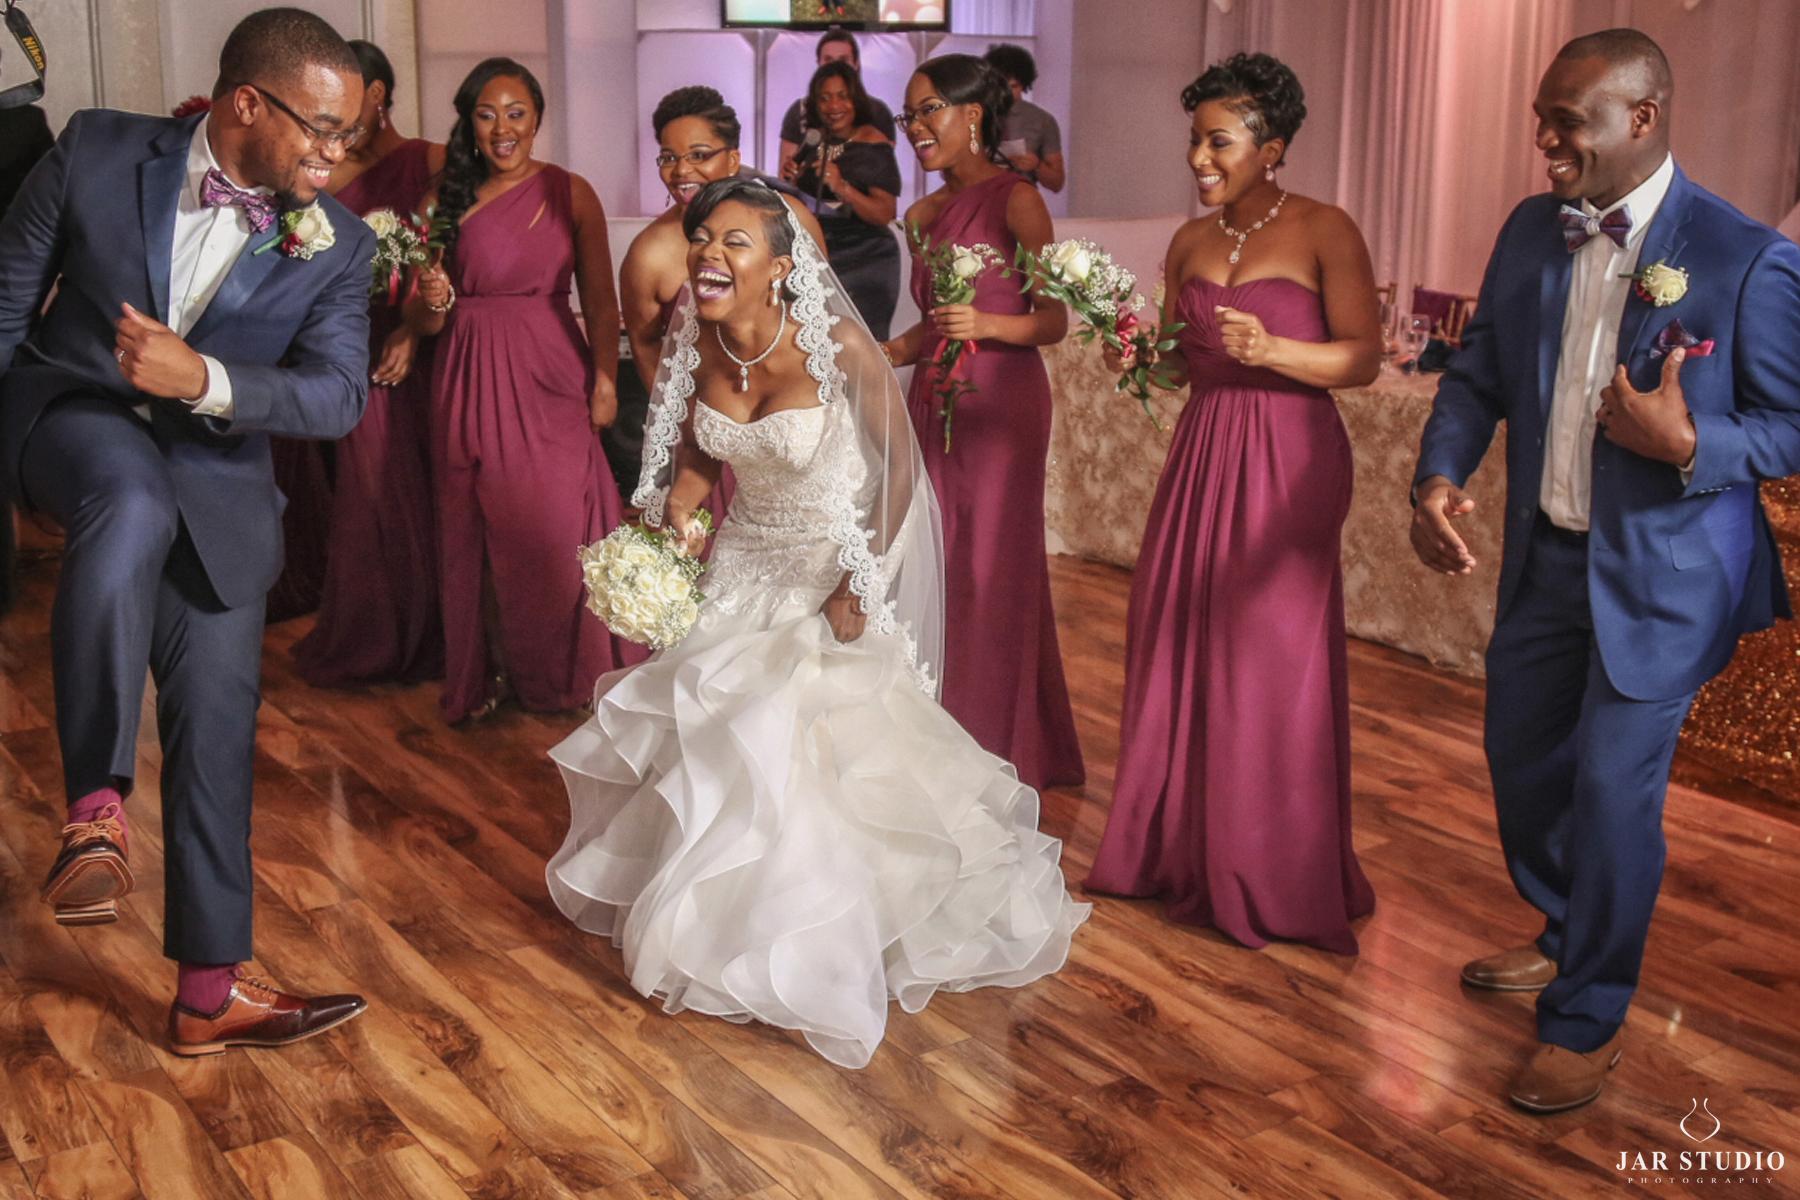 33-fun-reception-venue-Imperial Design Hall -jarstudio-wedding-photographer.JPG